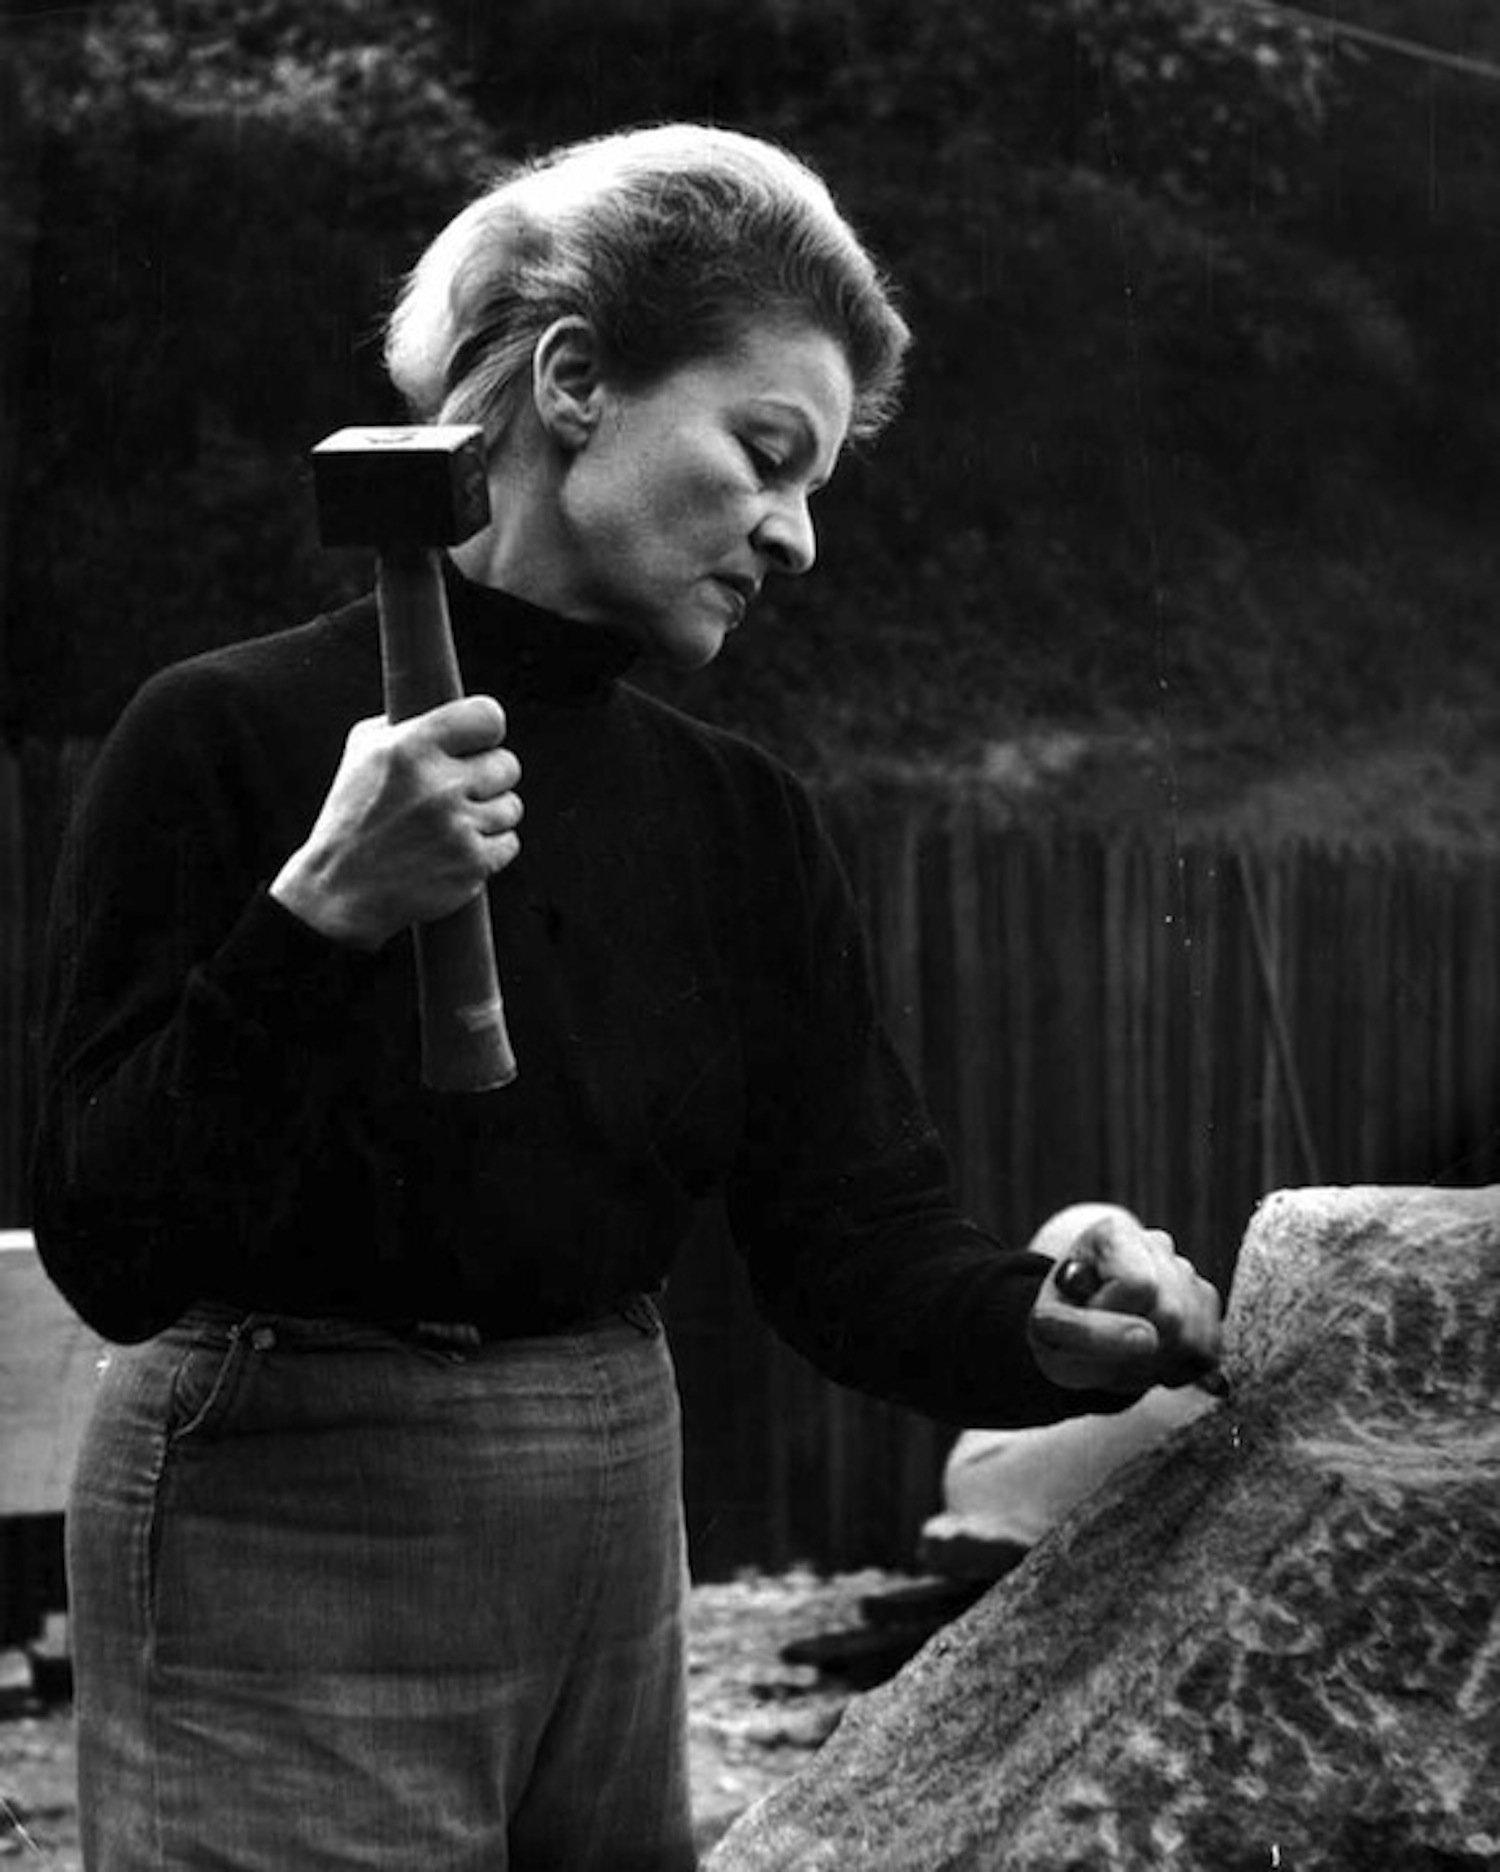 Anna Mahler at work.